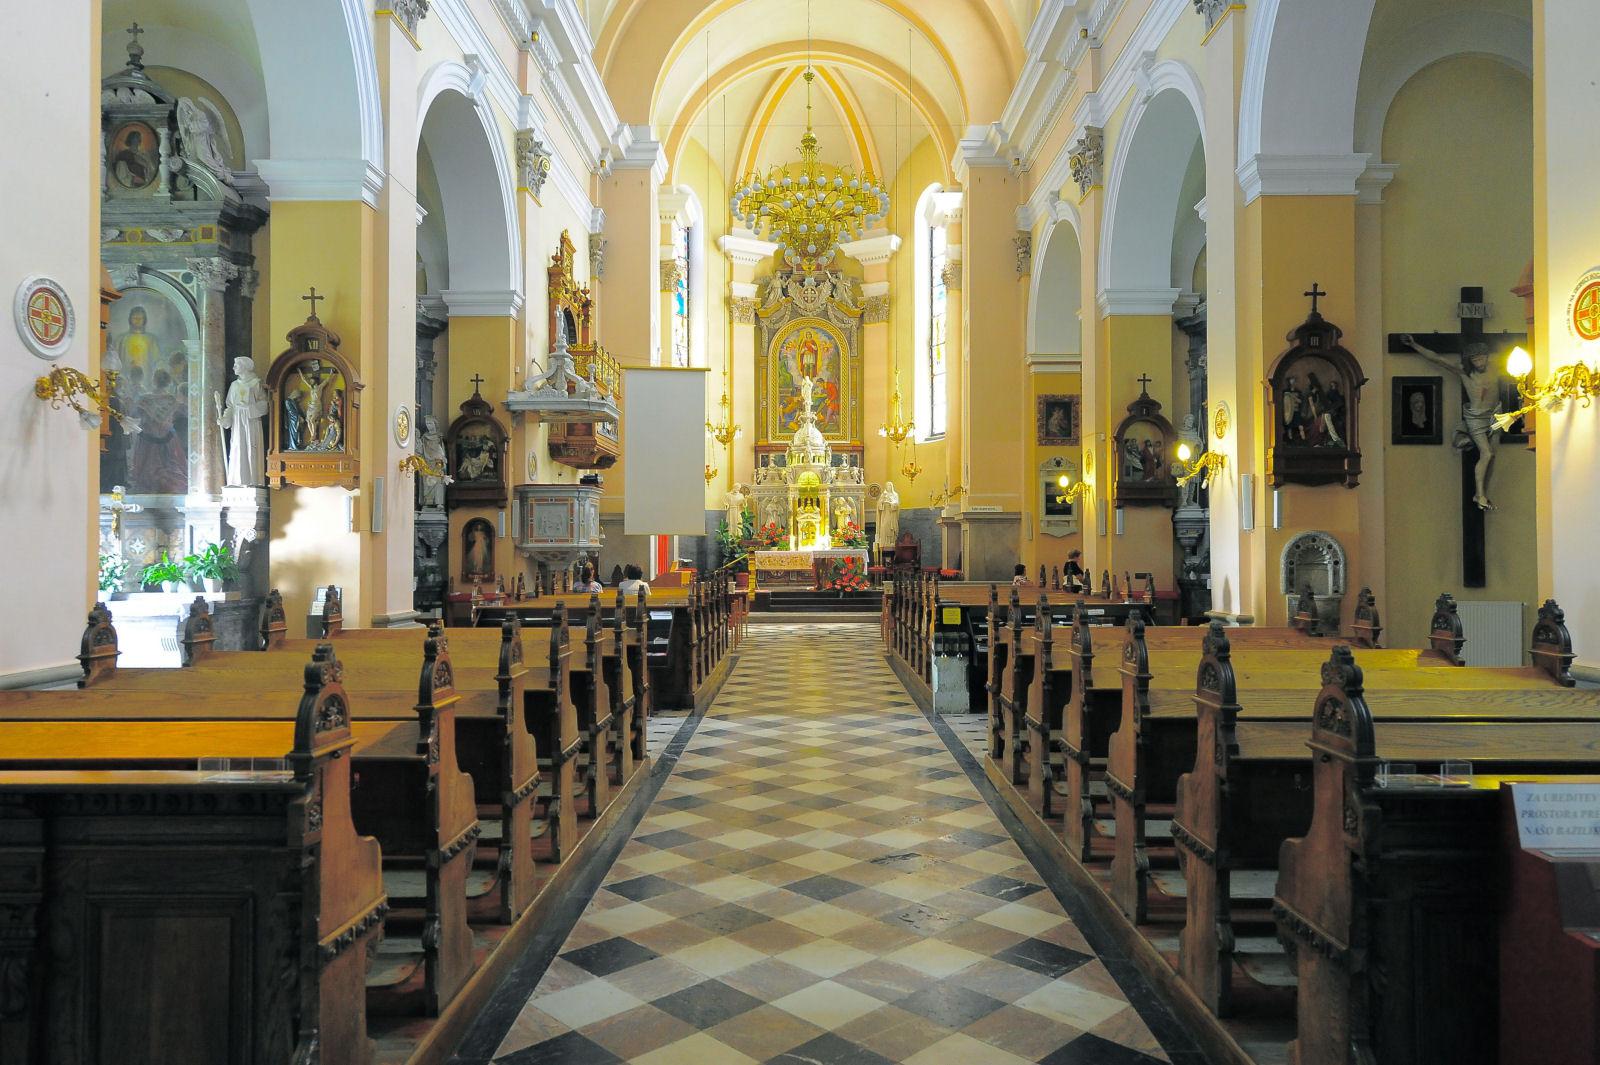 Interior of the Basilica of Mary Help of Christians, Brezje, Radovljica, Slovenia